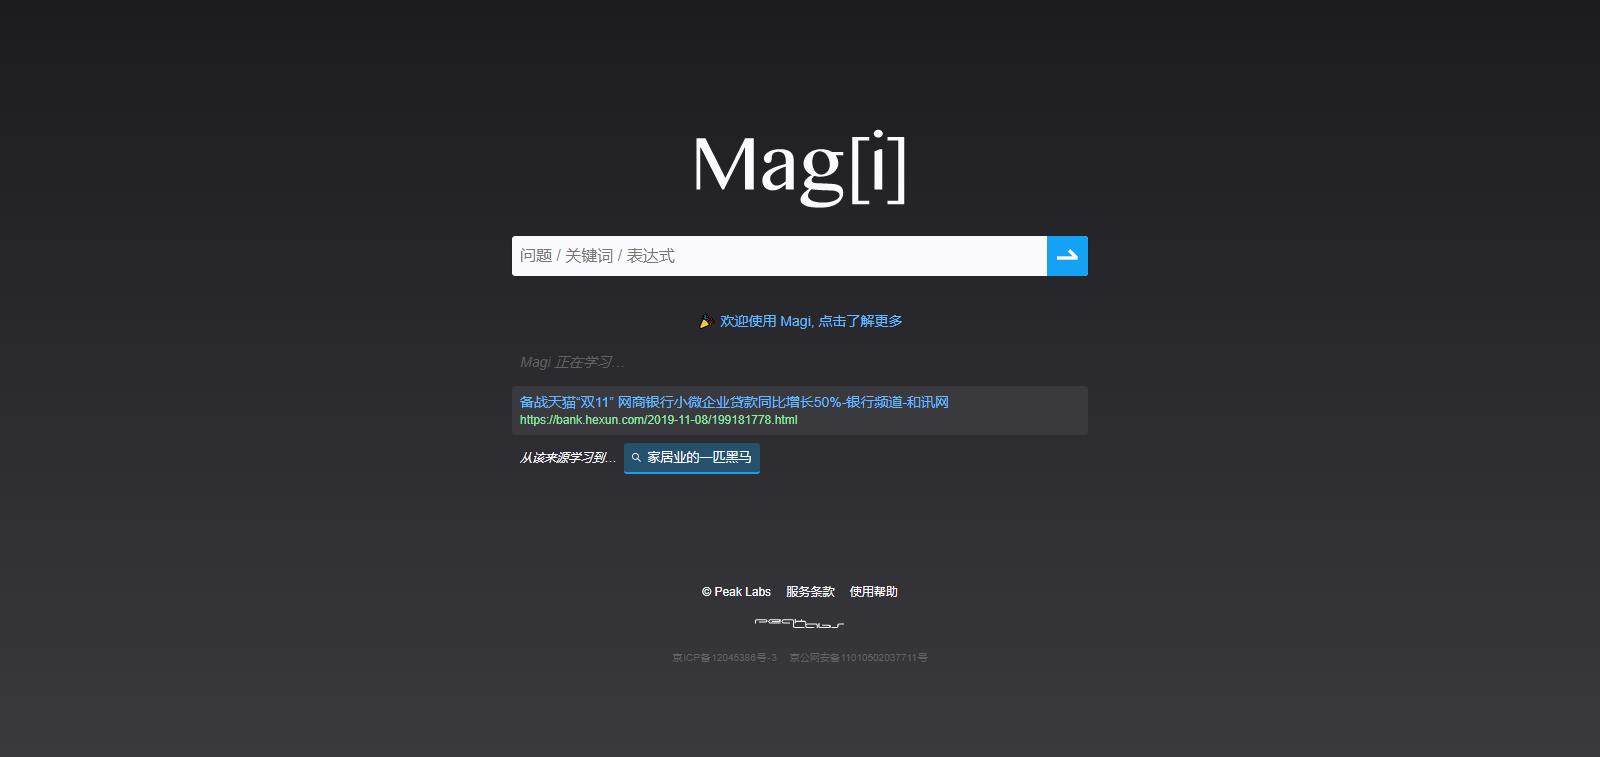 Magi–人工智能搜索引擎